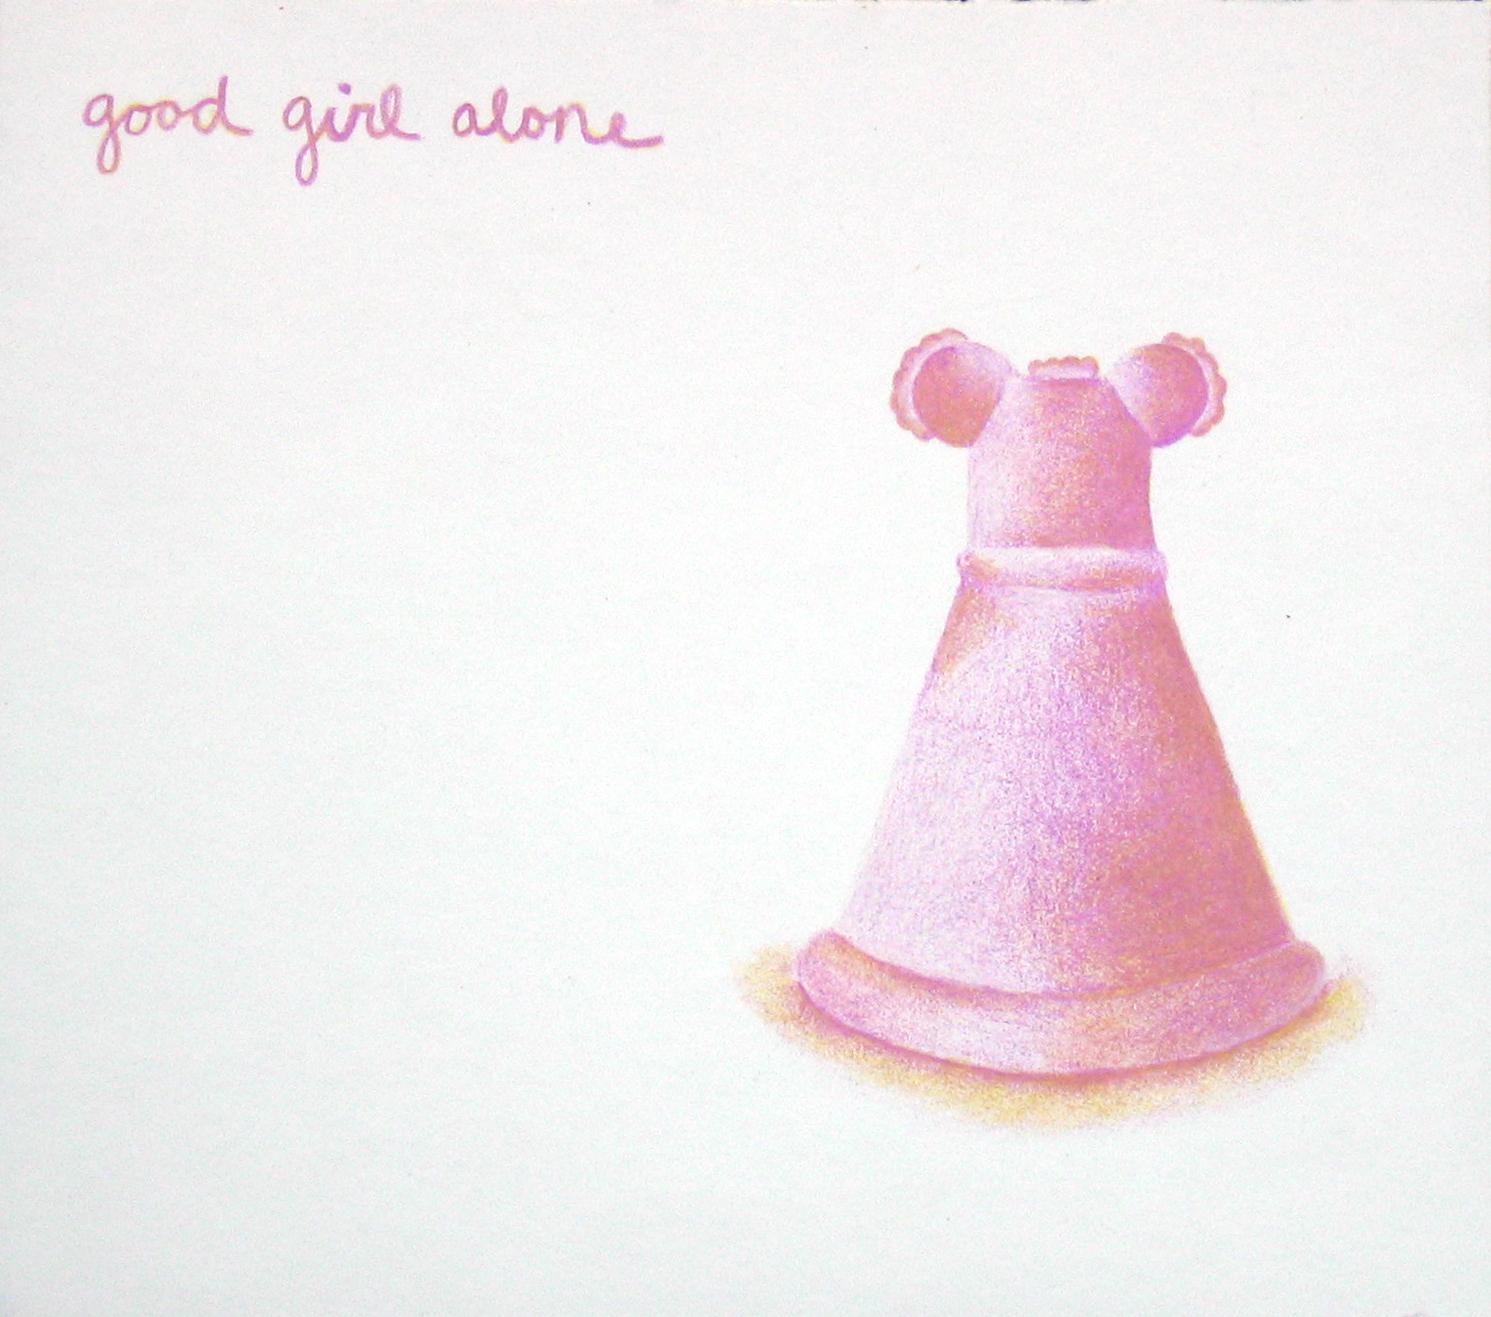 Good Girl Alone